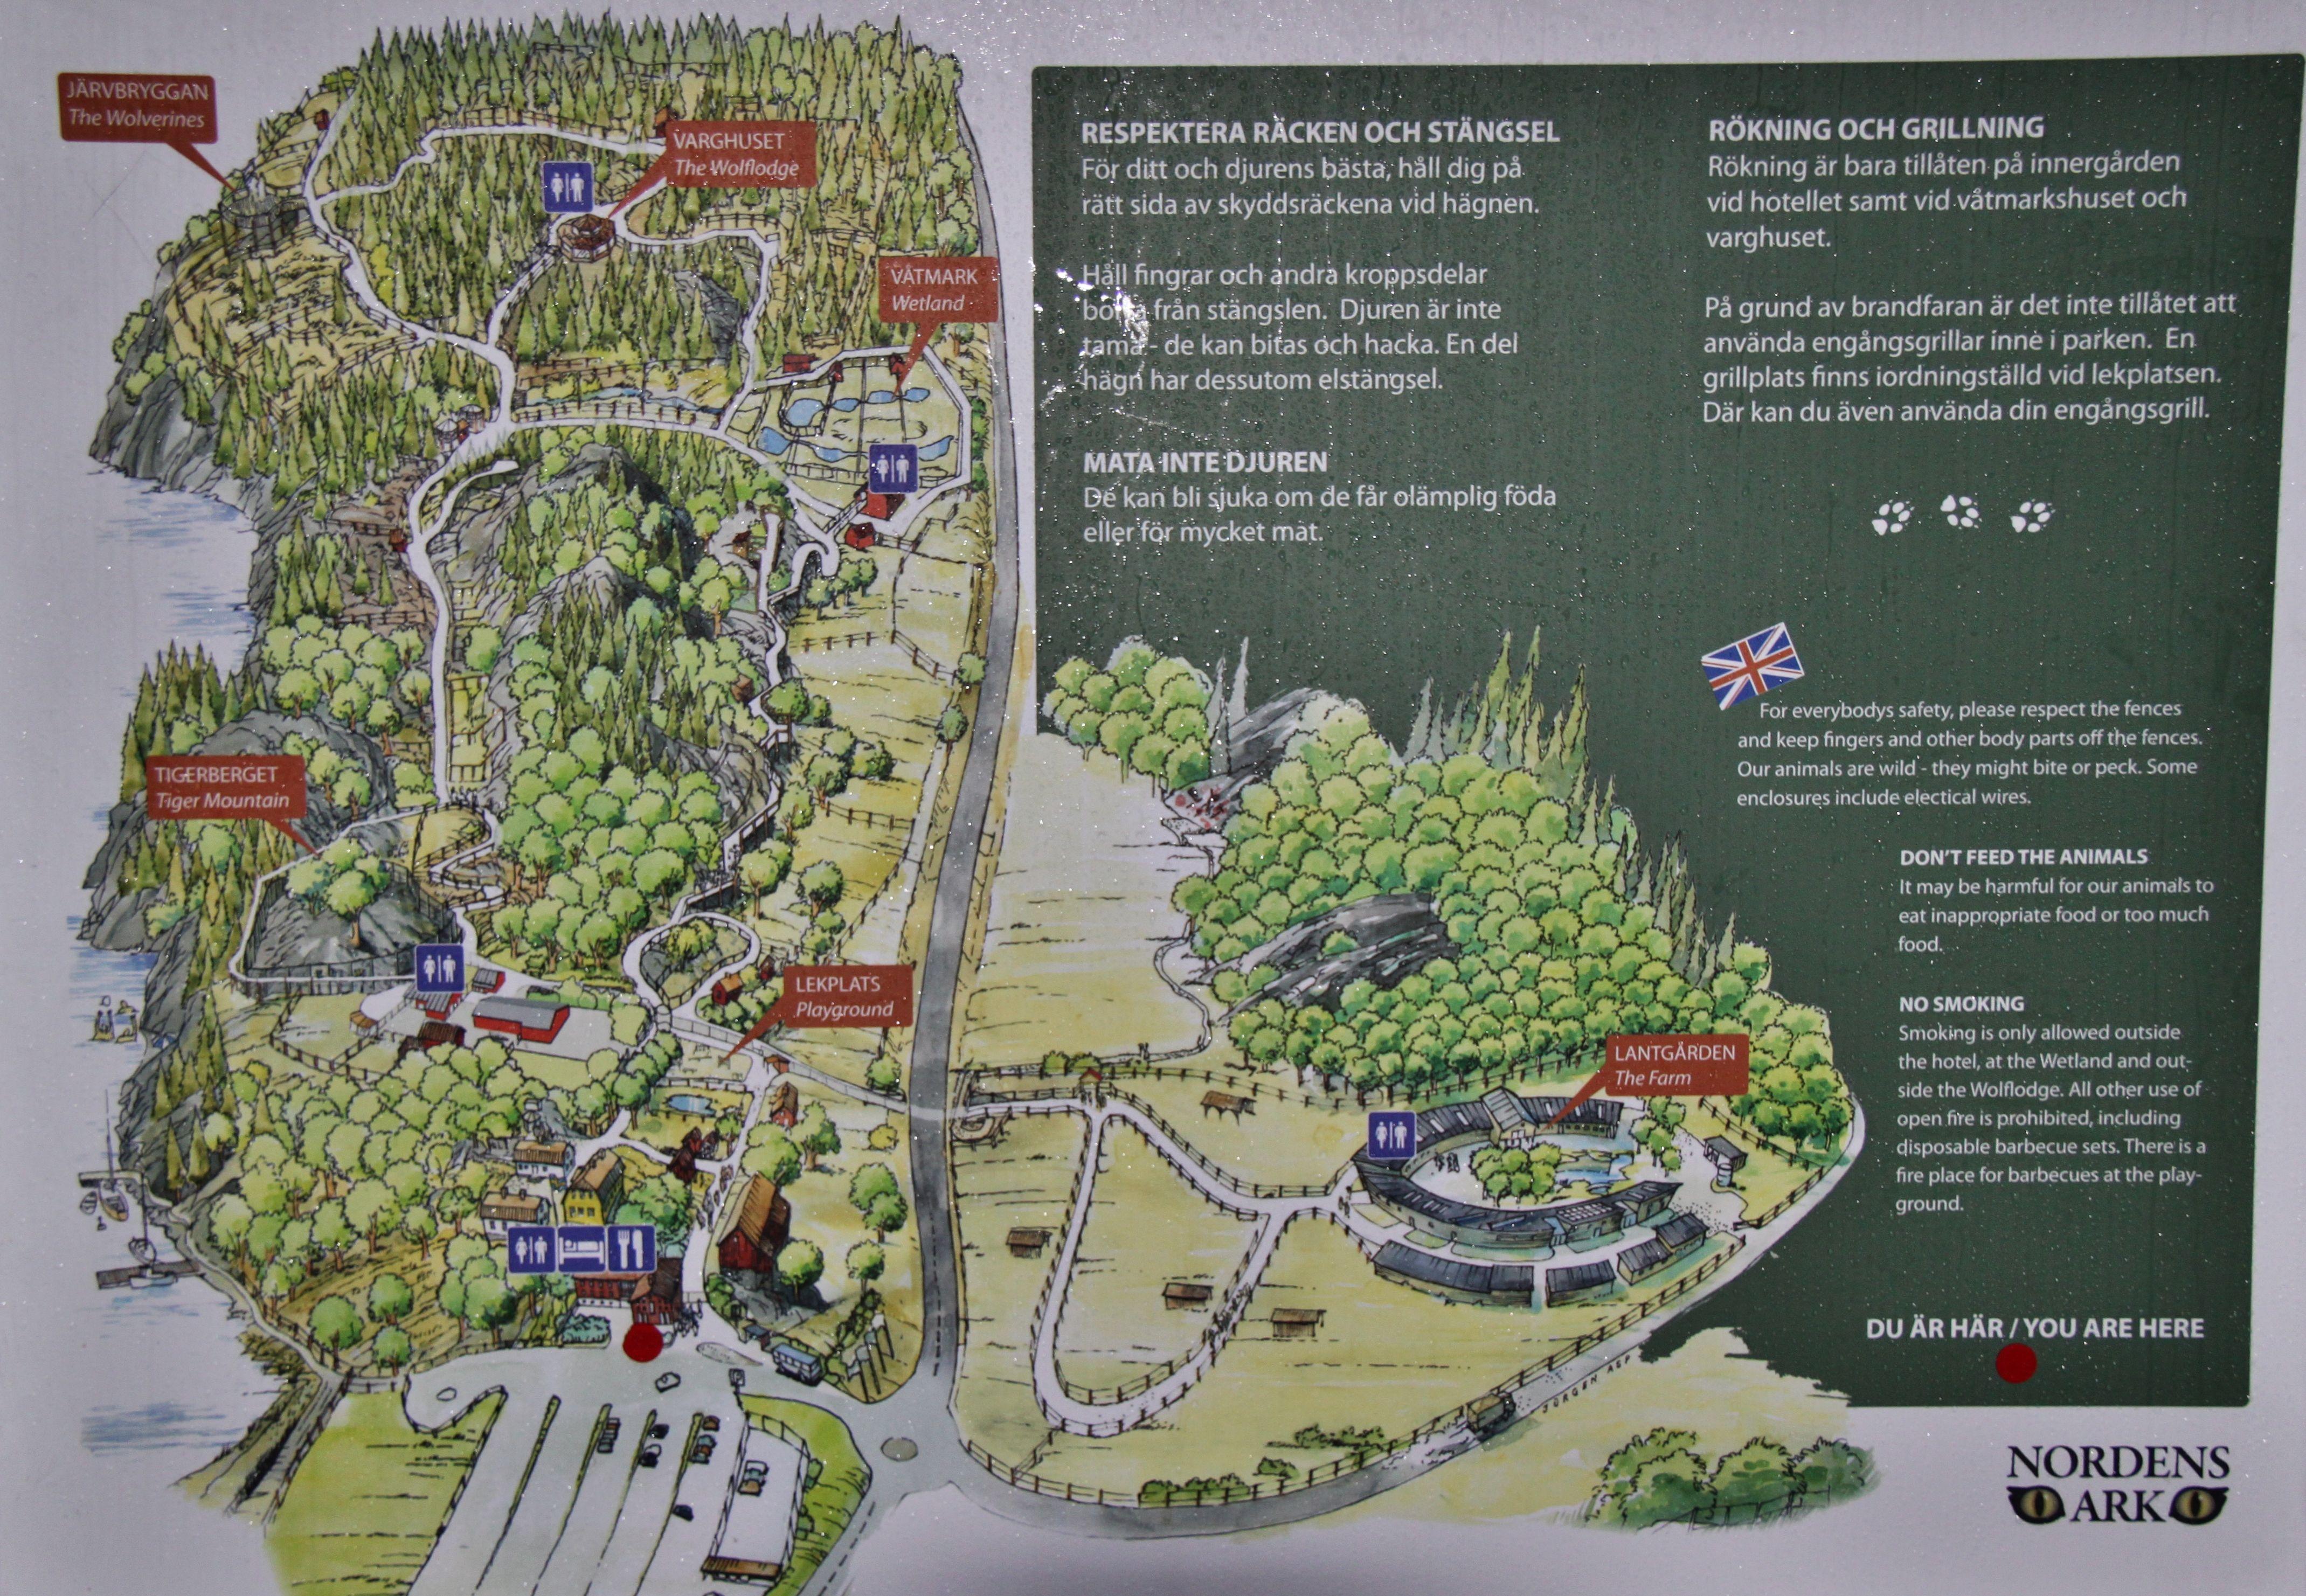 Nordens Ark Bohusl Sweden Travels In 2013 Places